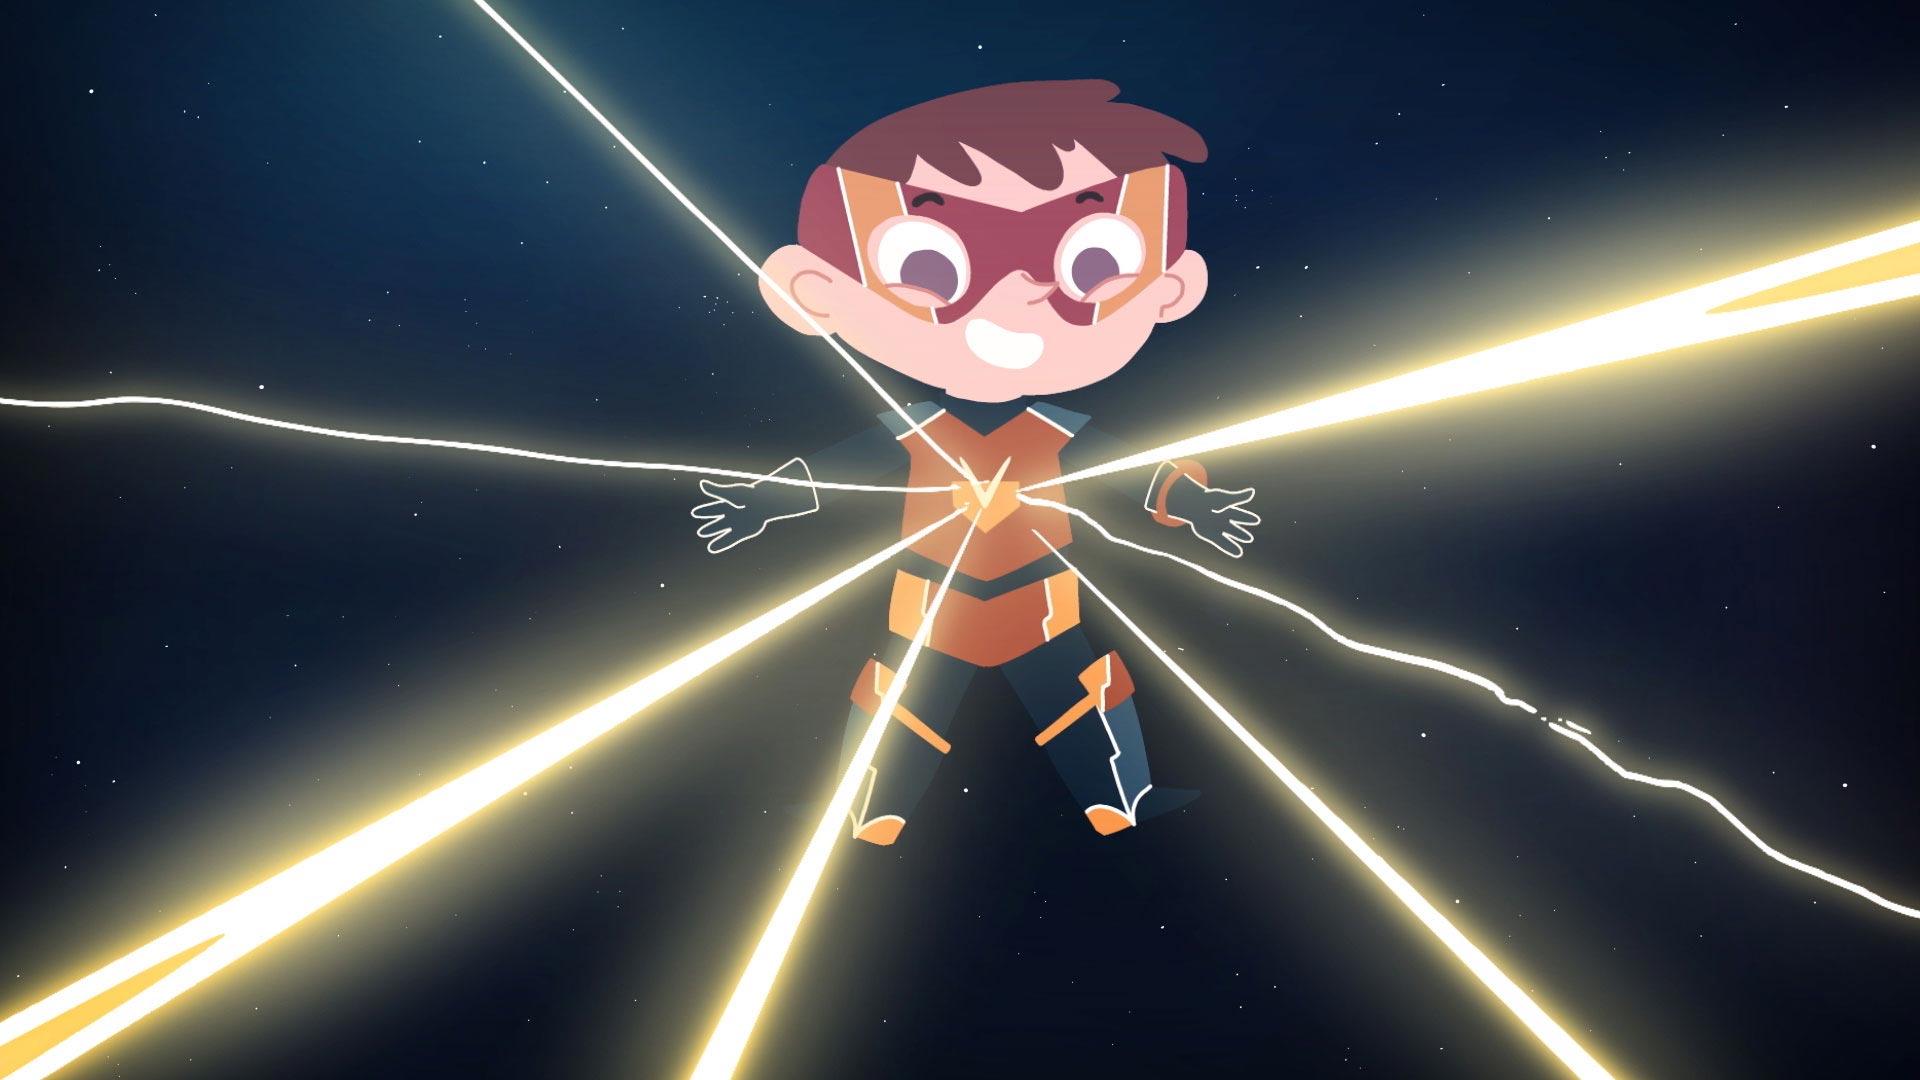 LordMeningococco_animation_character_racoonstudio_motion_educom_13